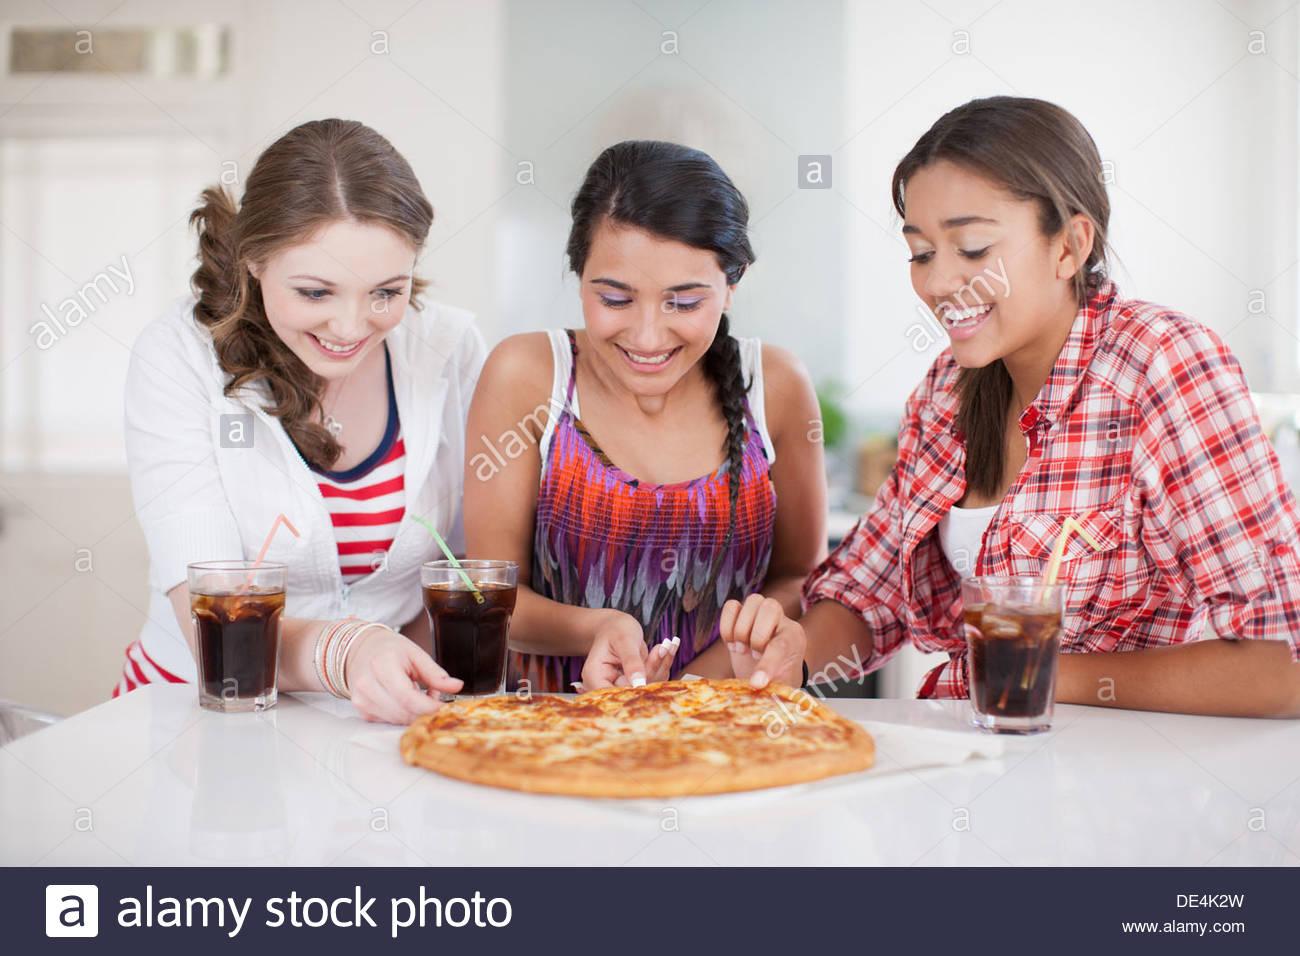 Teenage girls eating pizza - Stock Image